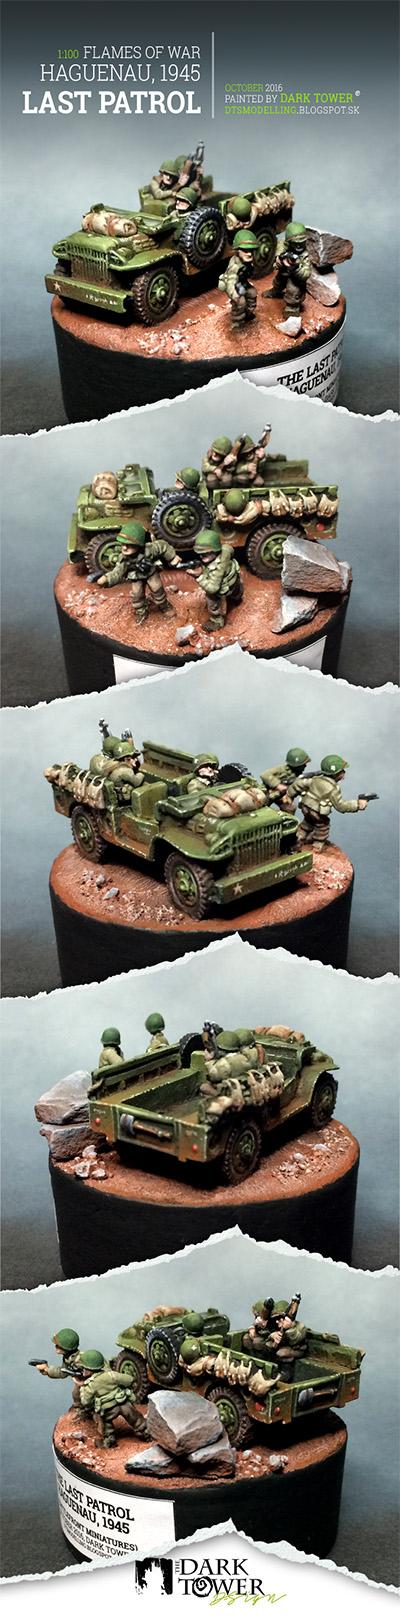 1:100 The Last Patrol, Haguenau, 1945 (Flames Of War, Battlefront Miniatures)